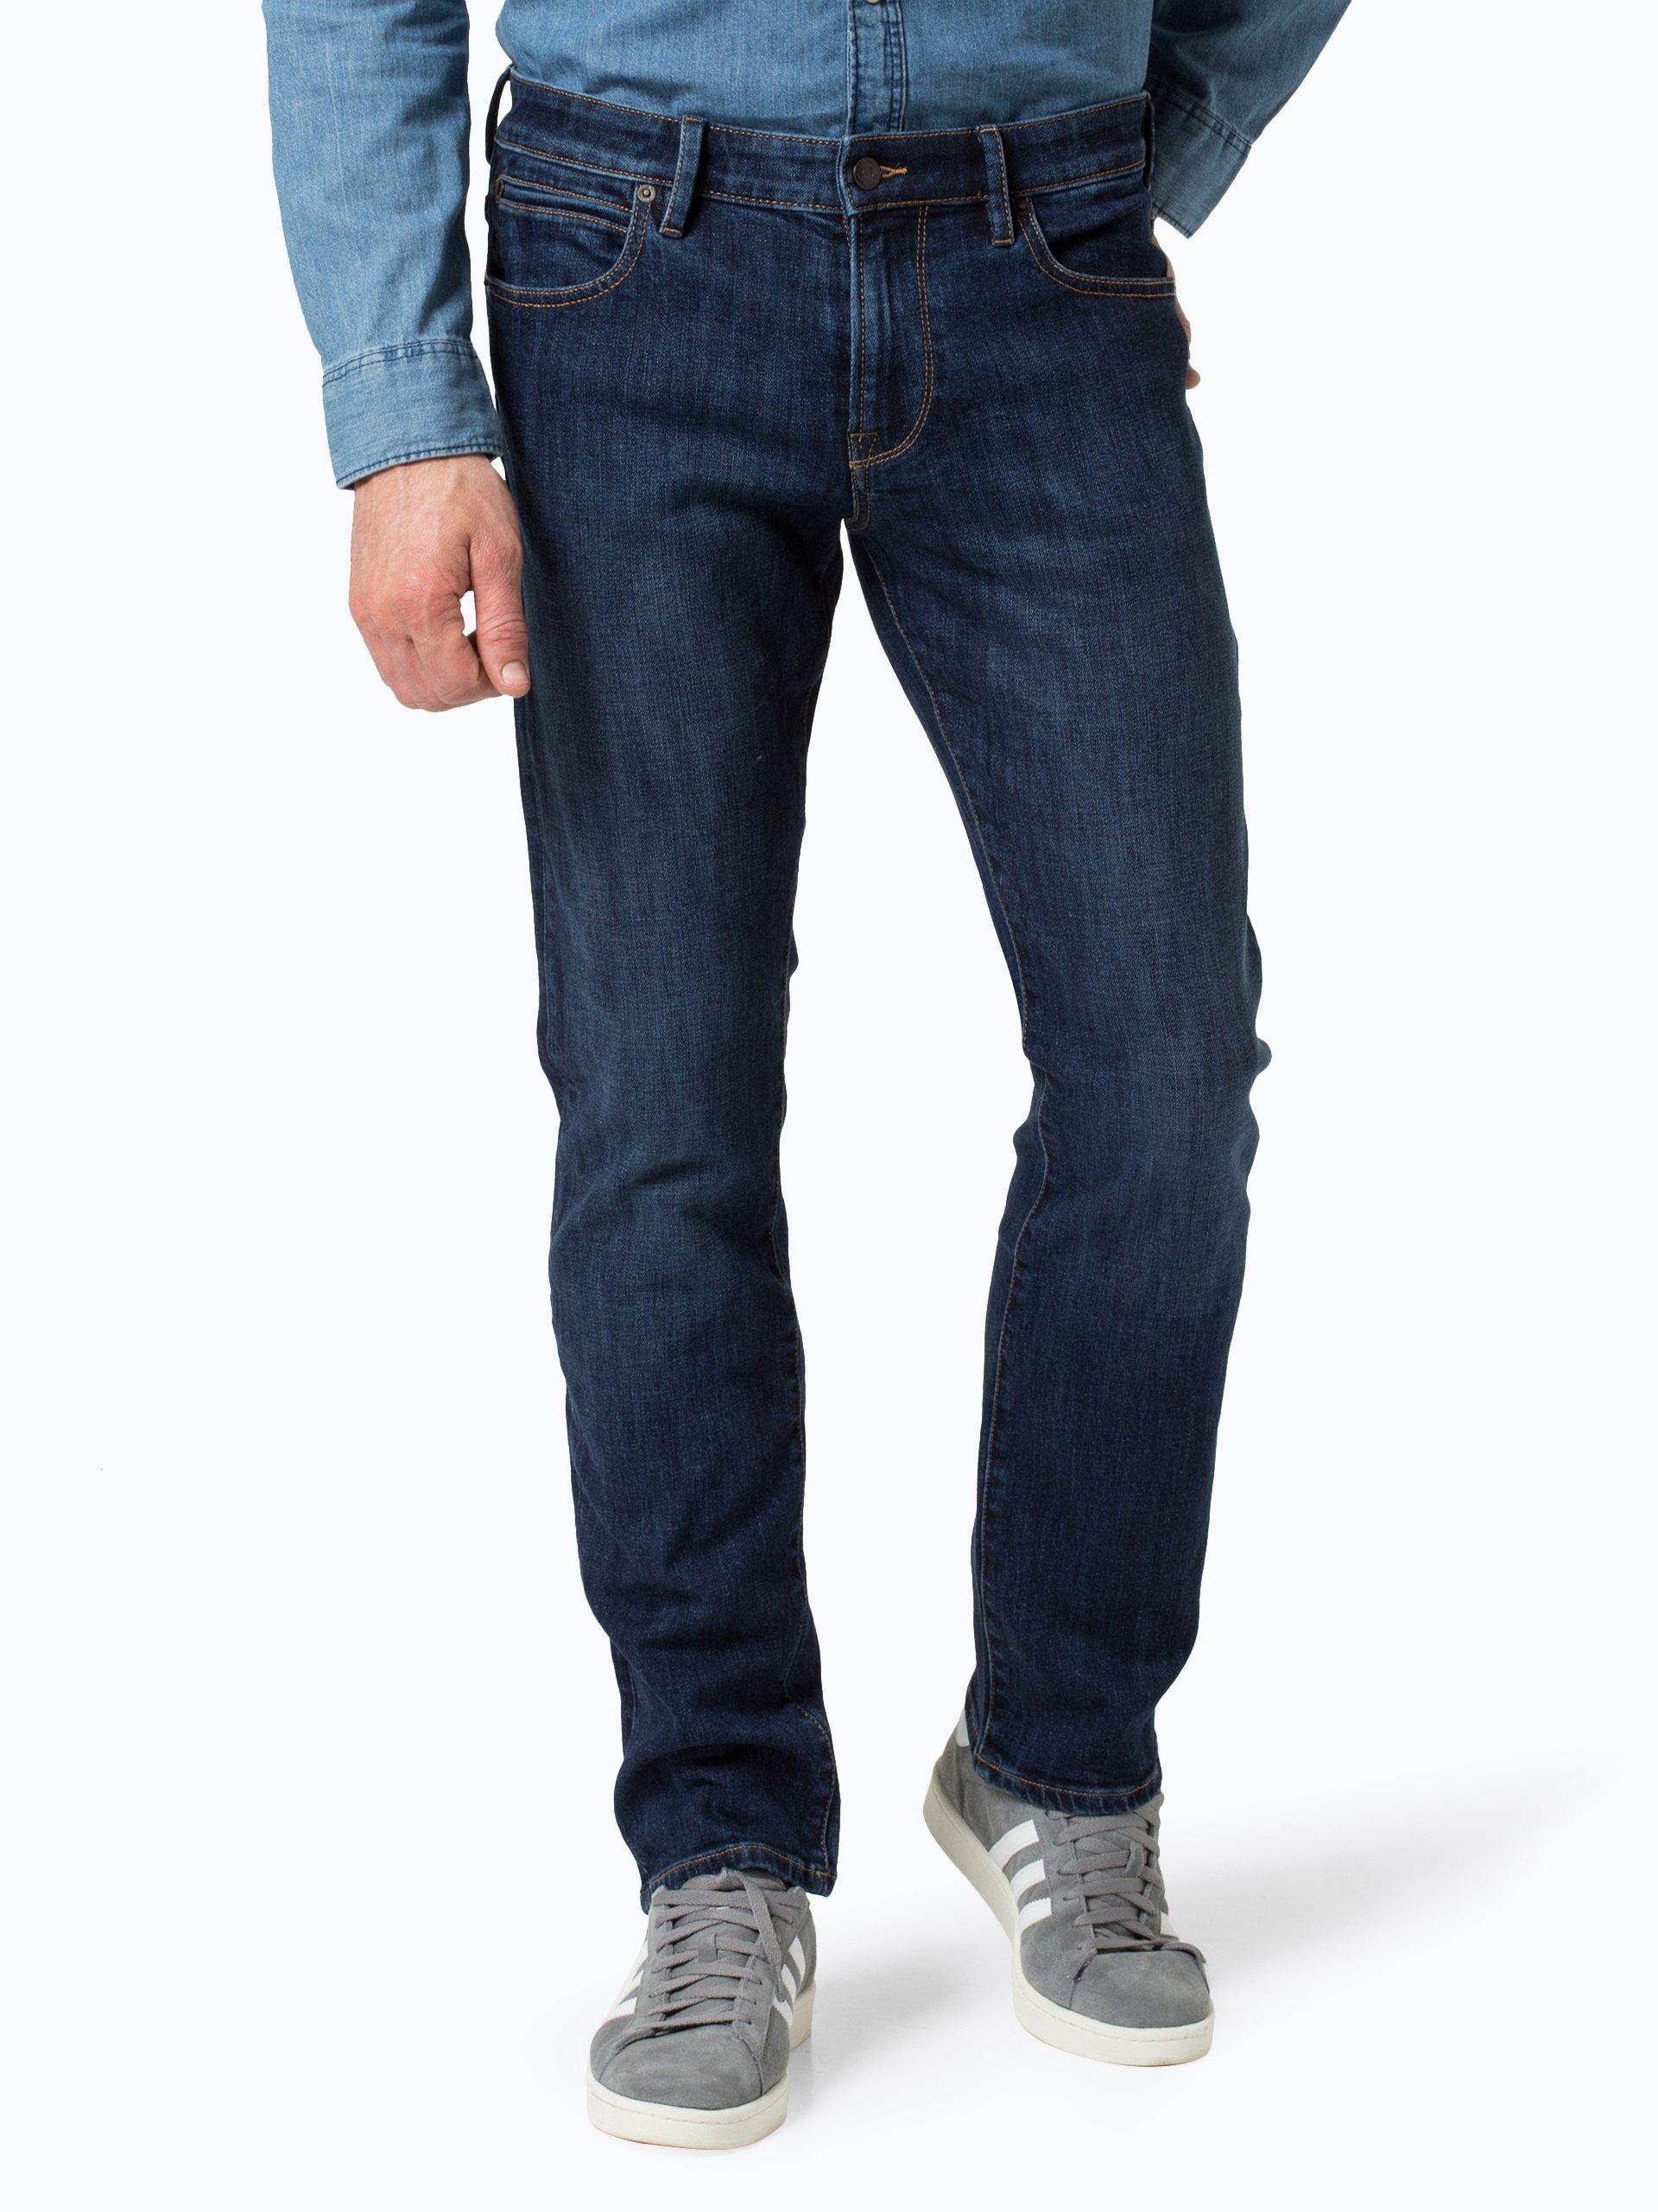 boss orange herren jeans orange24 denim uni online kaufen vangraaf com. Black Bedroom Furniture Sets. Home Design Ideas